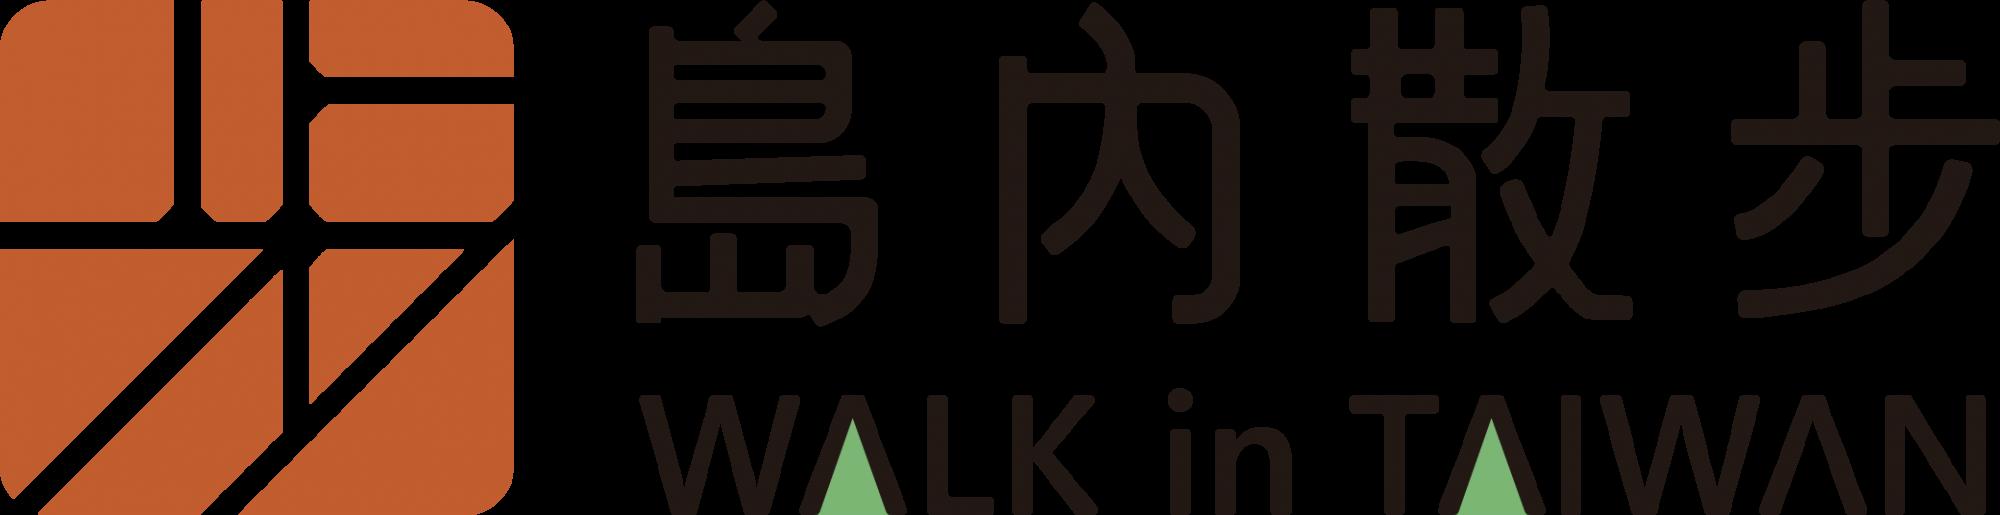 島內散步-logo.png